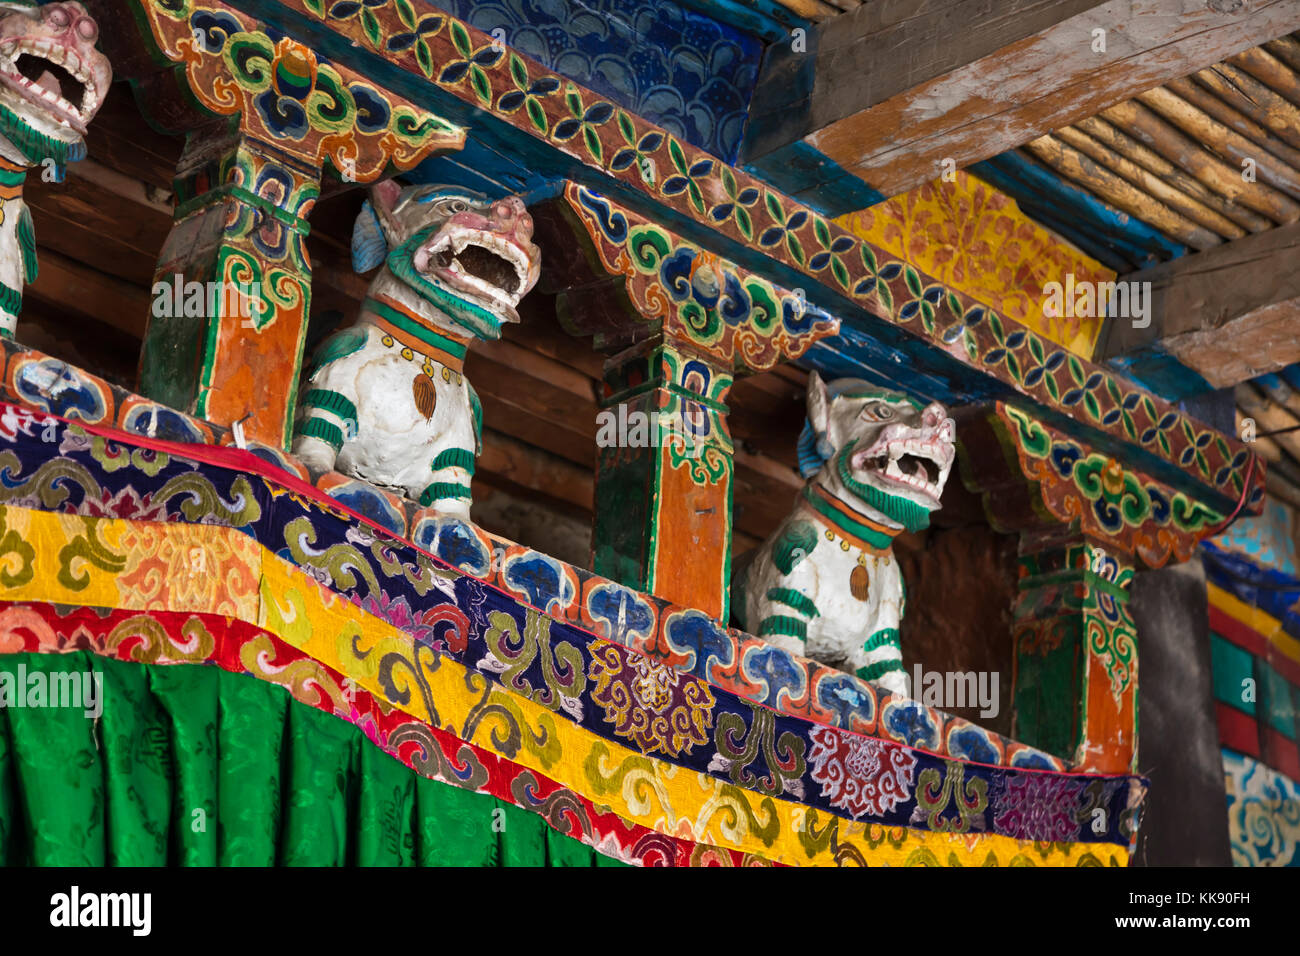 SNOW LIONS guard the entrance to a Buddhist chapel at the RANGDUM MONASTERY - ZANSKAR, LADAKH, INDIA - Stock Image